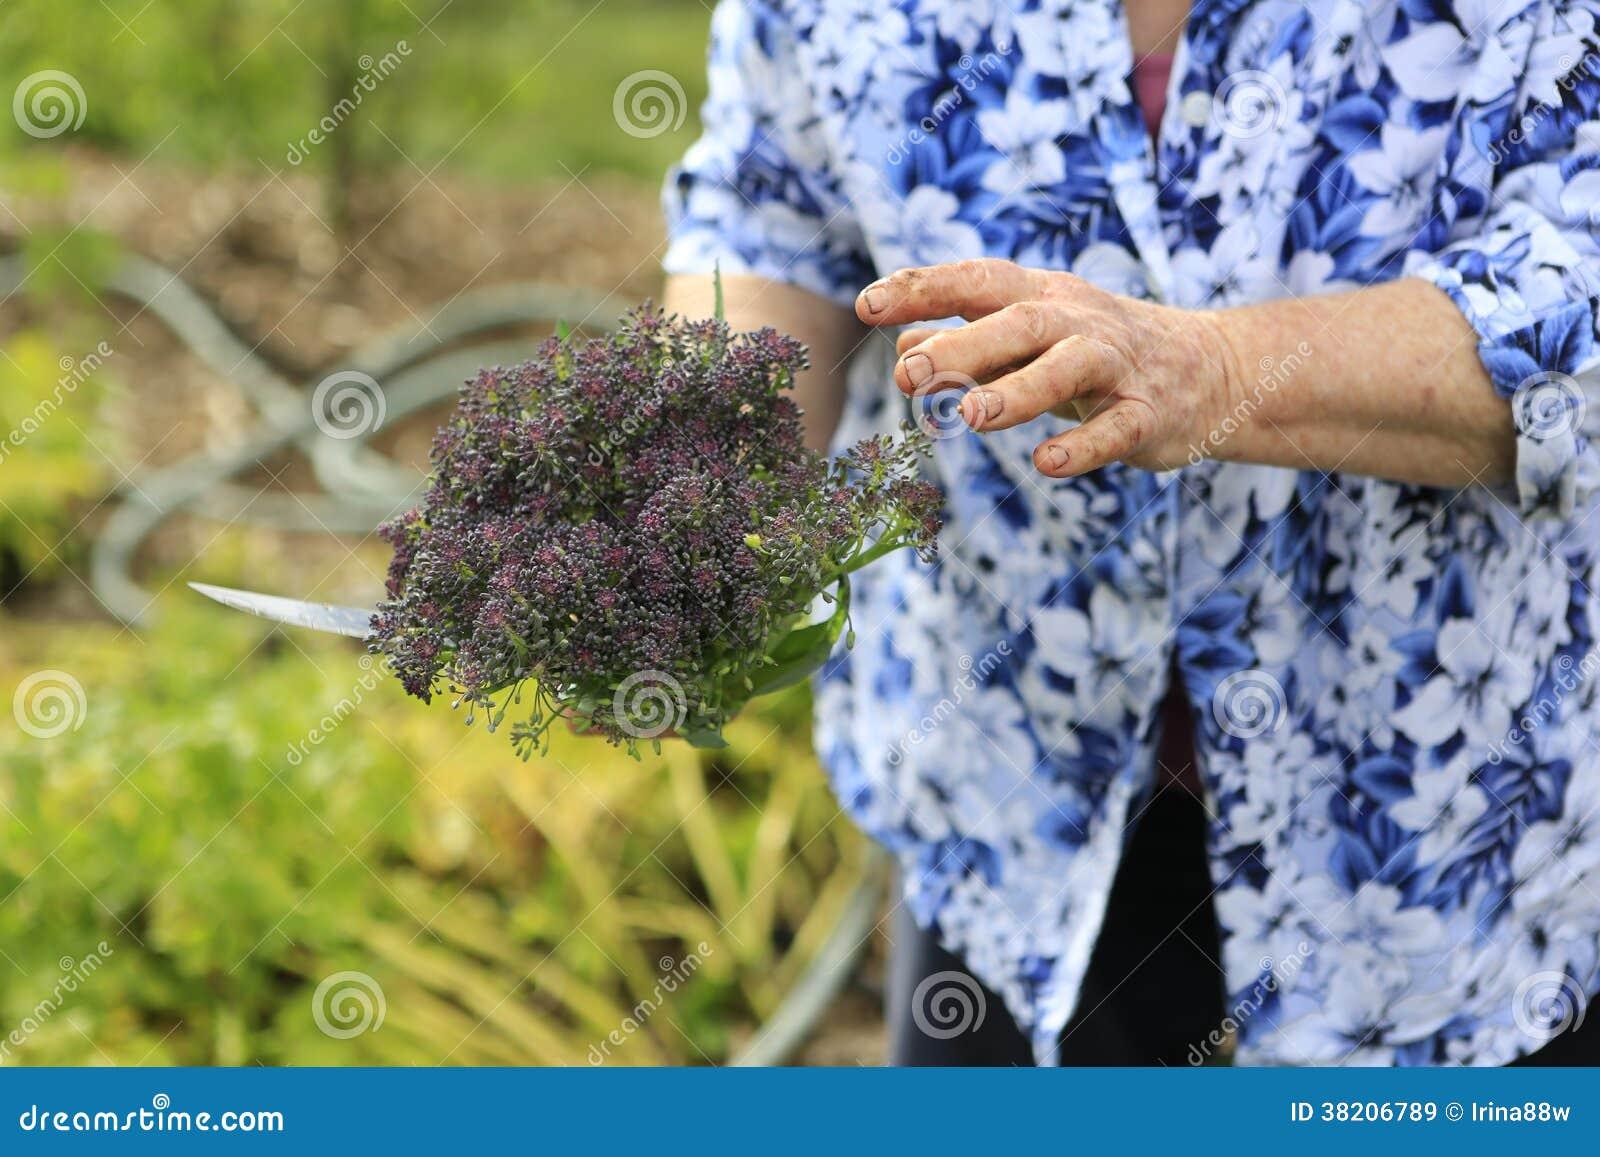 gr ner purpurroter brokkoli der im biogarten w chst. Black Bedroom Furniture Sets. Home Design Ideas